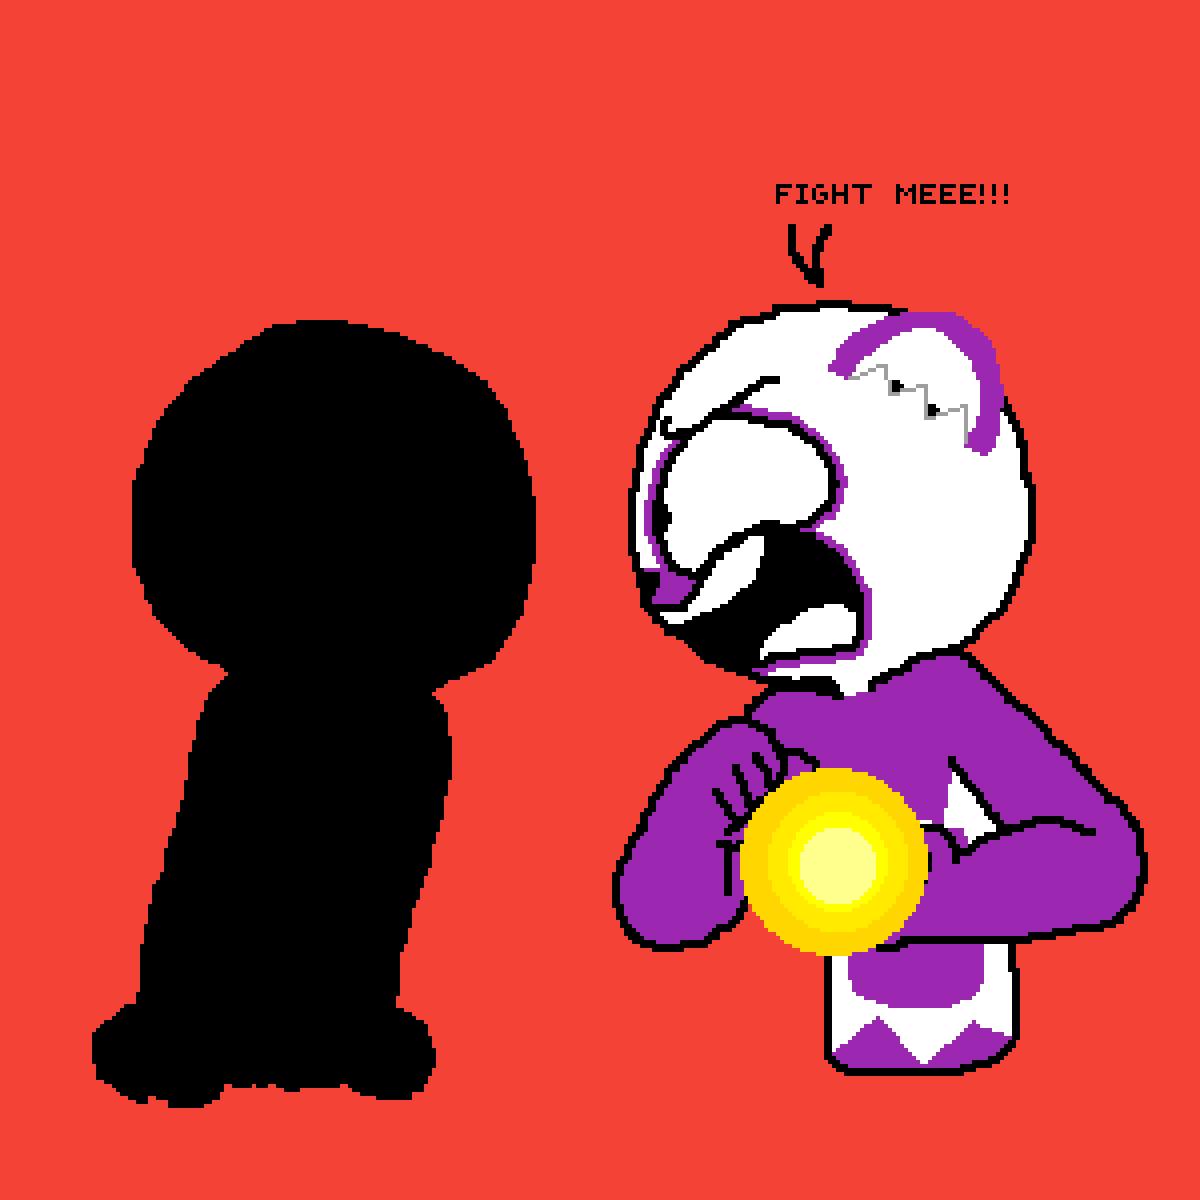 SOMEONE FIGHT ME!!!!!!!! by Purplepanda1121